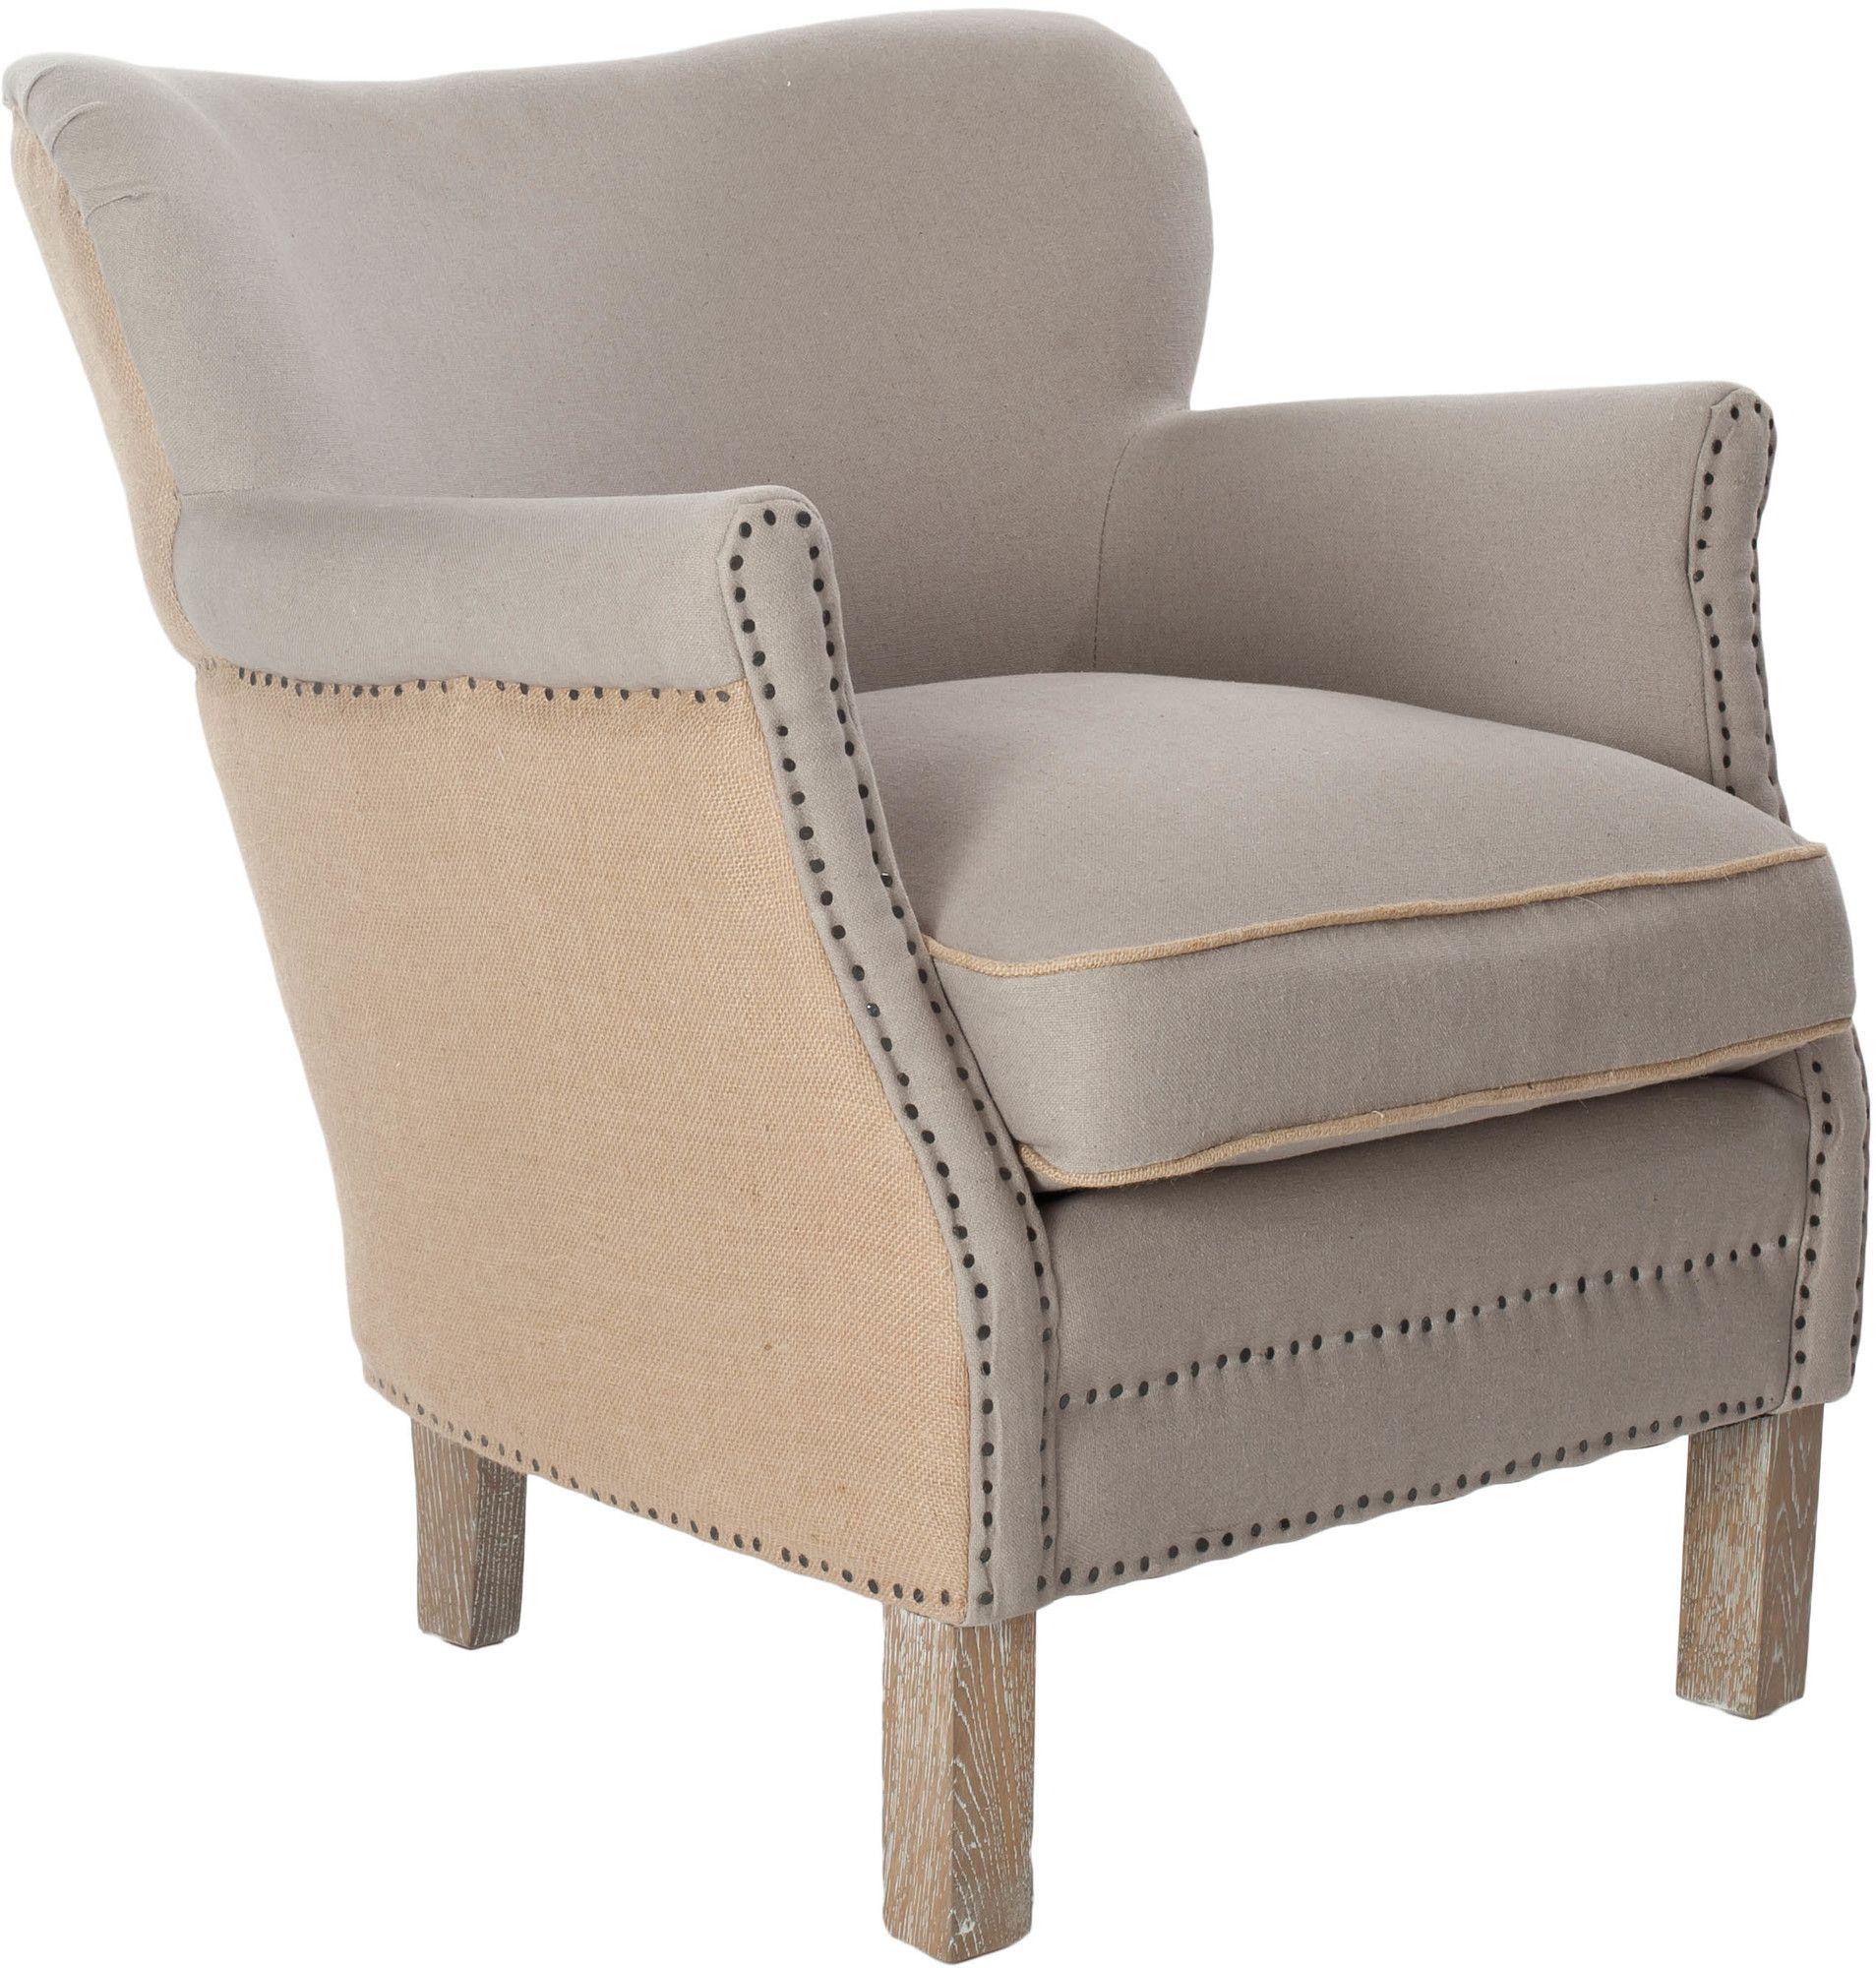 Safavieh Amanda Chair II | AllModern | Upholstered arm ...